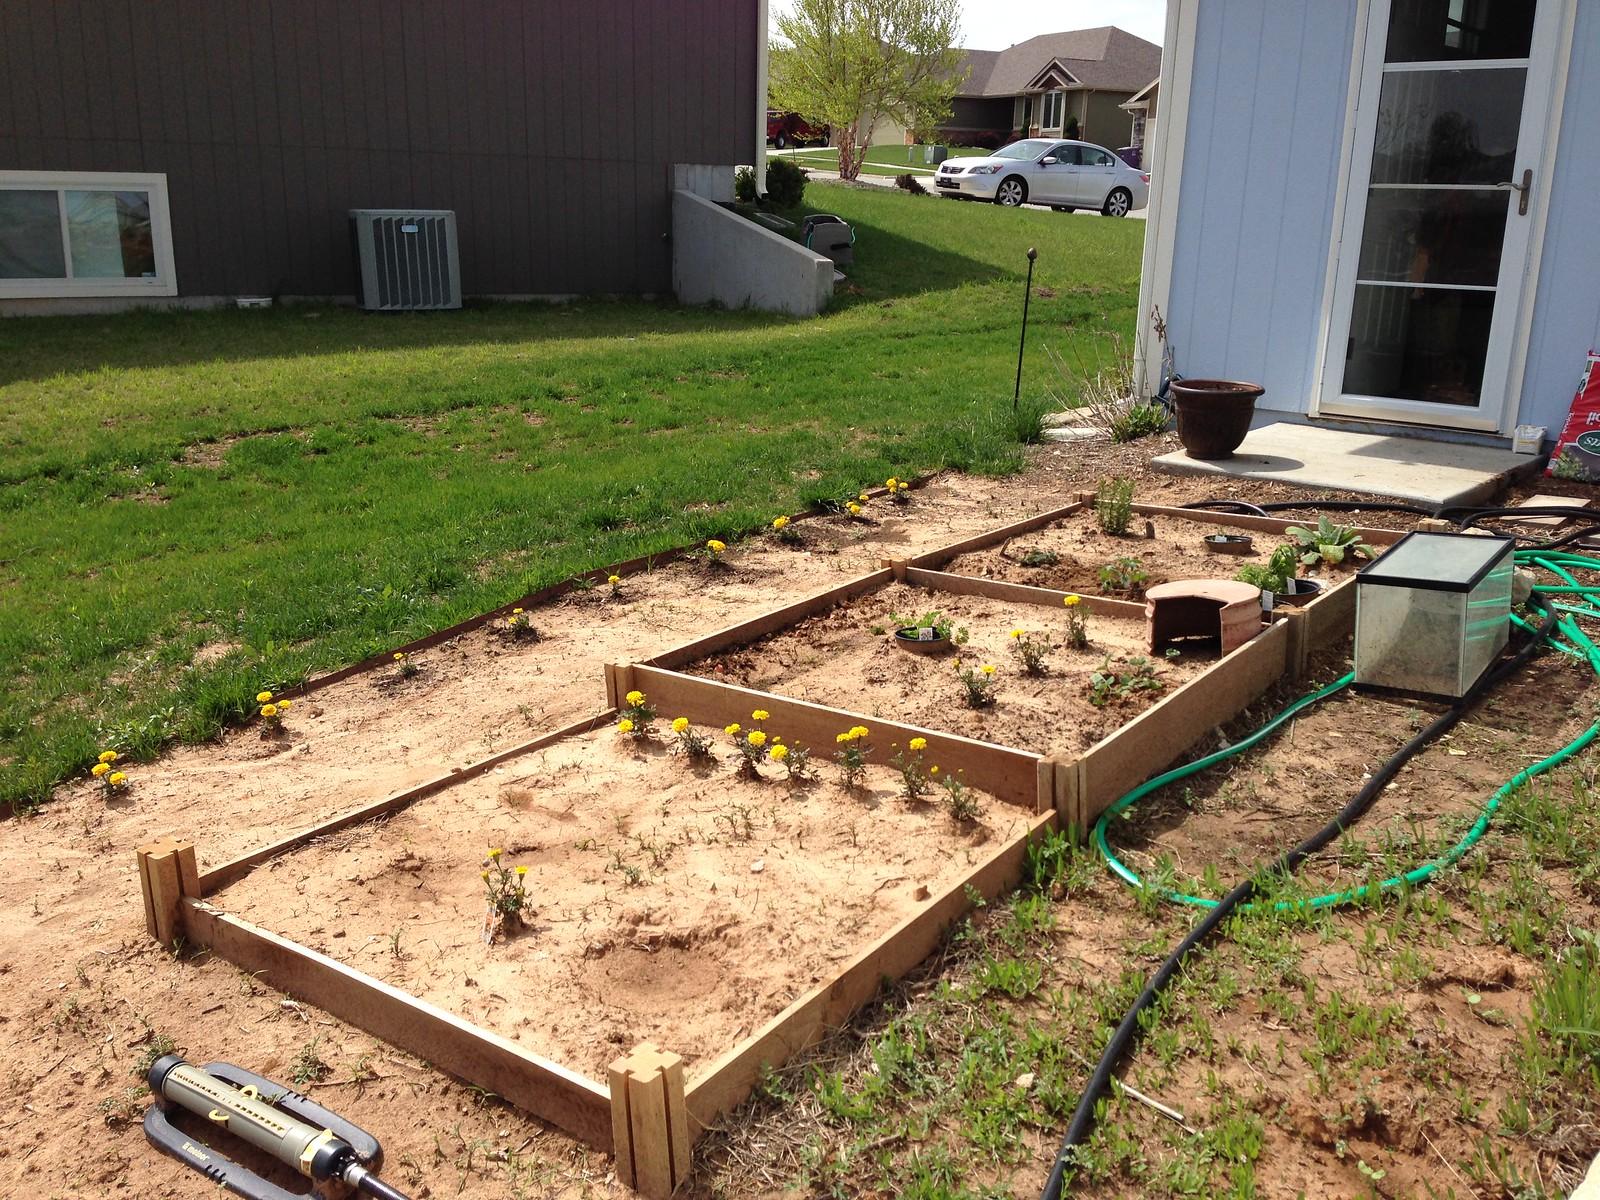 2015-04-27 backyard and kitchen garden